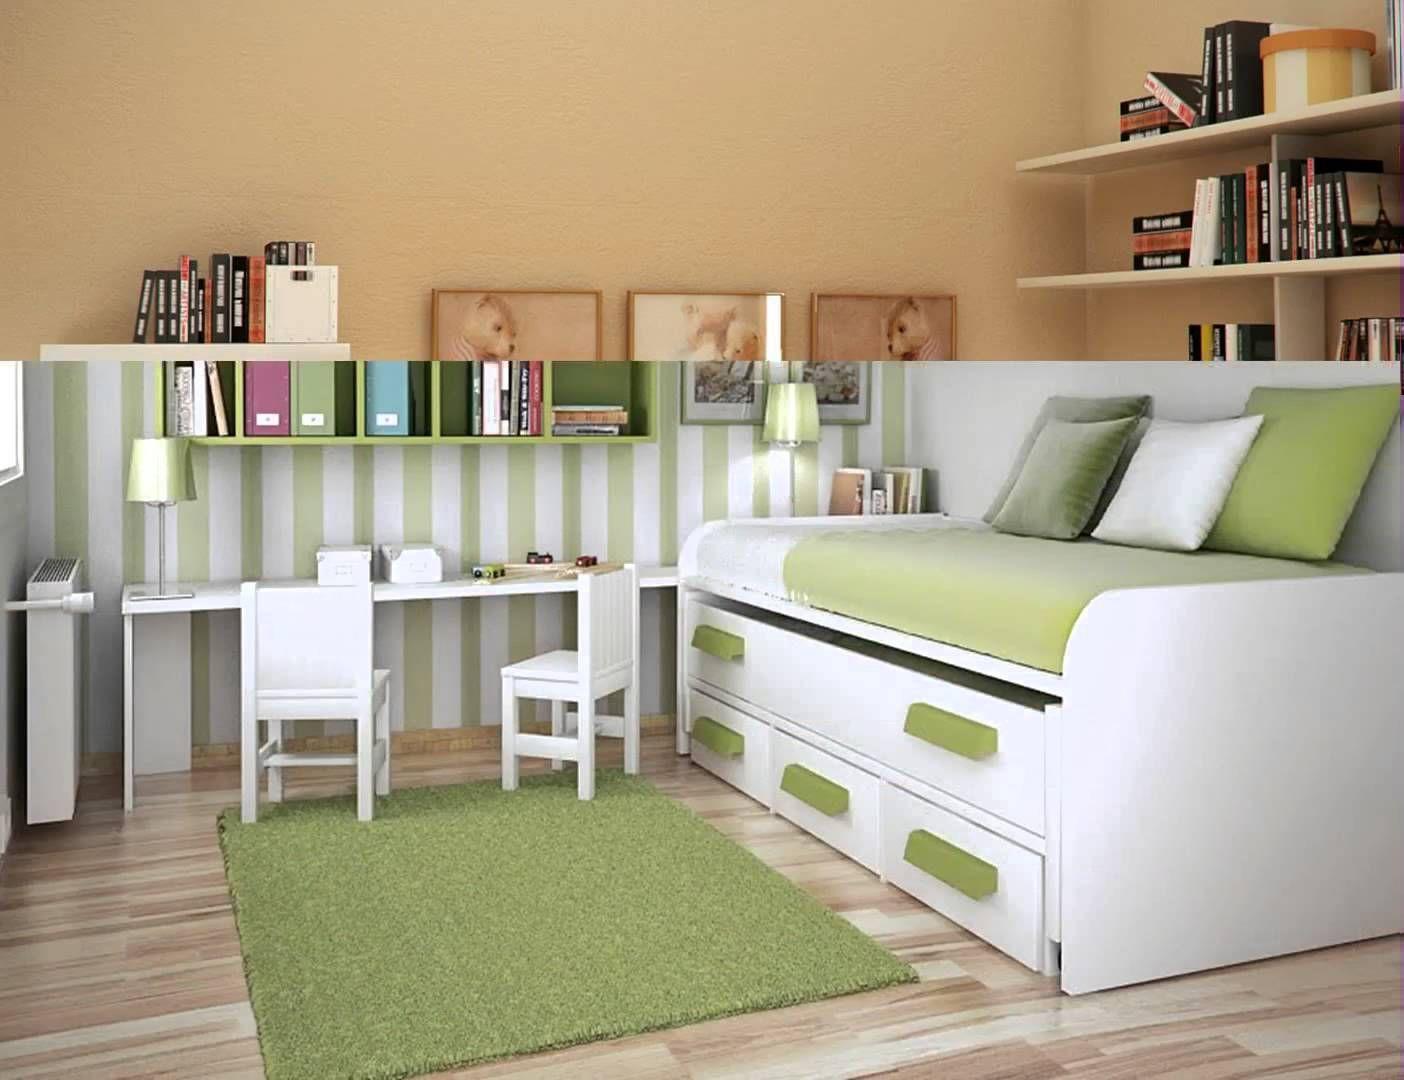 Design interior kamar minimalis - Tips Desain Interior Kamar Tidur Ukuran 2x2 Meter Minimalis